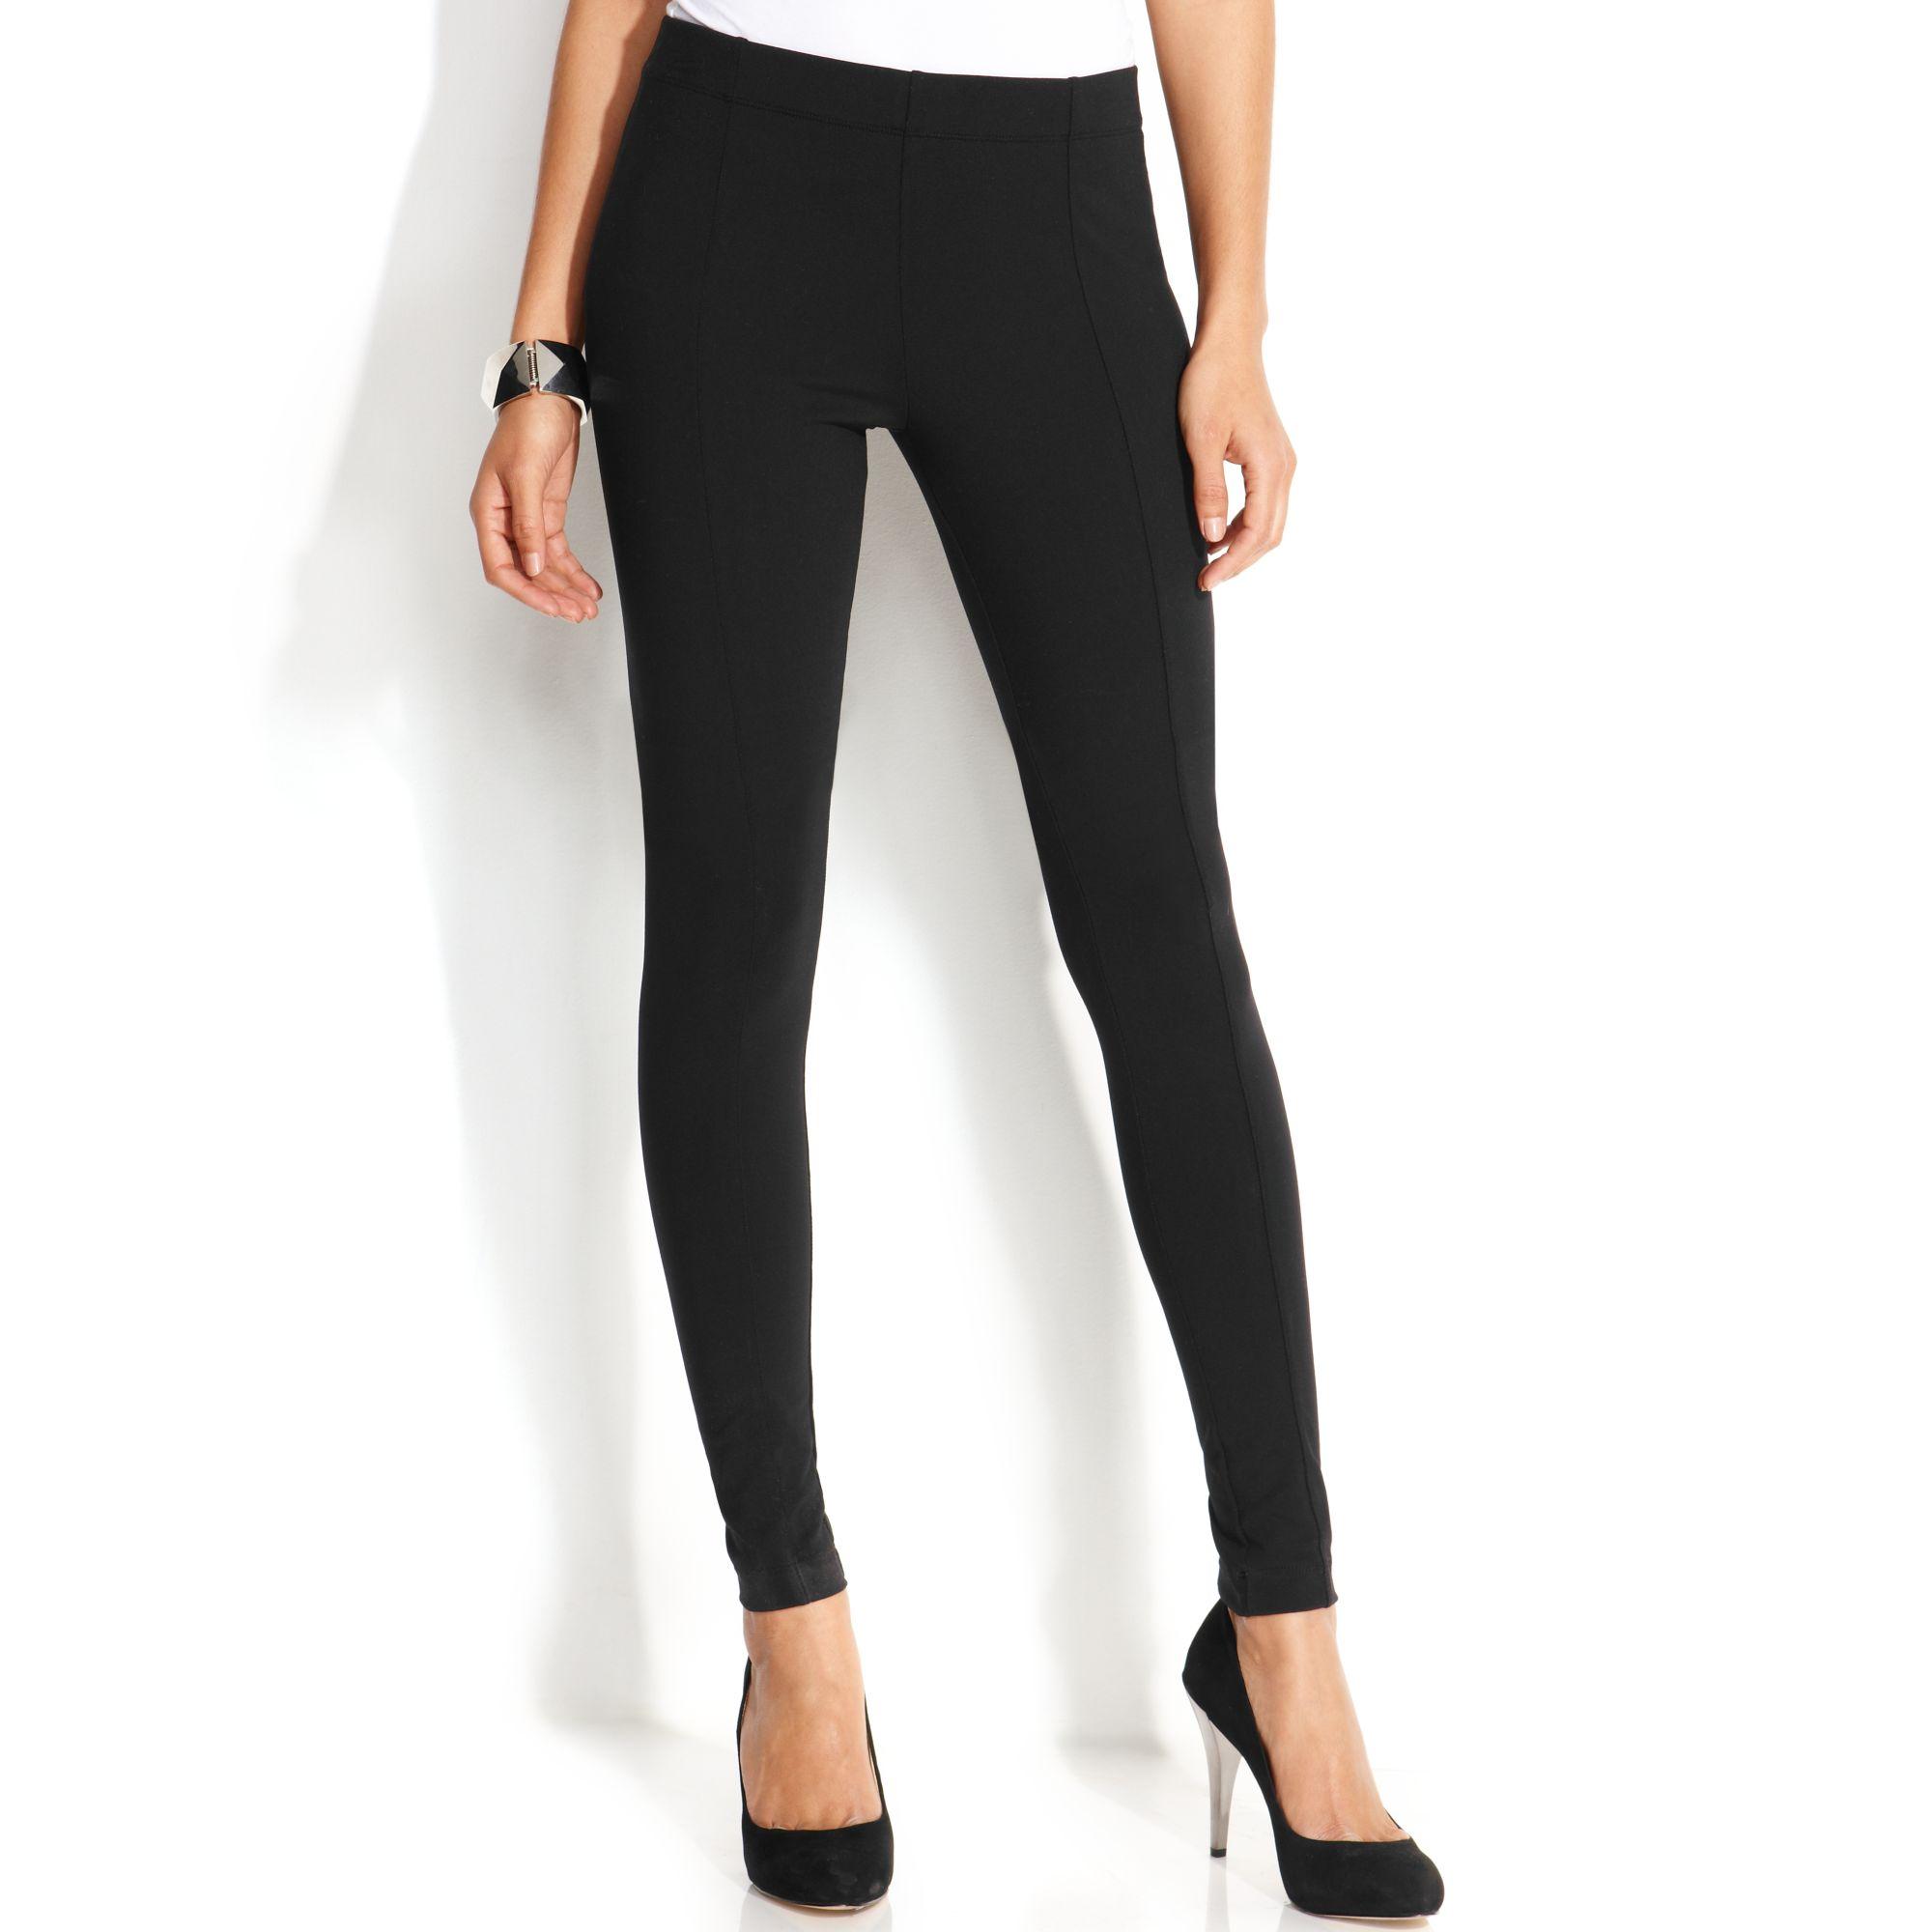 e256e991b3aef INC International Concepts Seamed Skinny Leggings in Black - Lyst